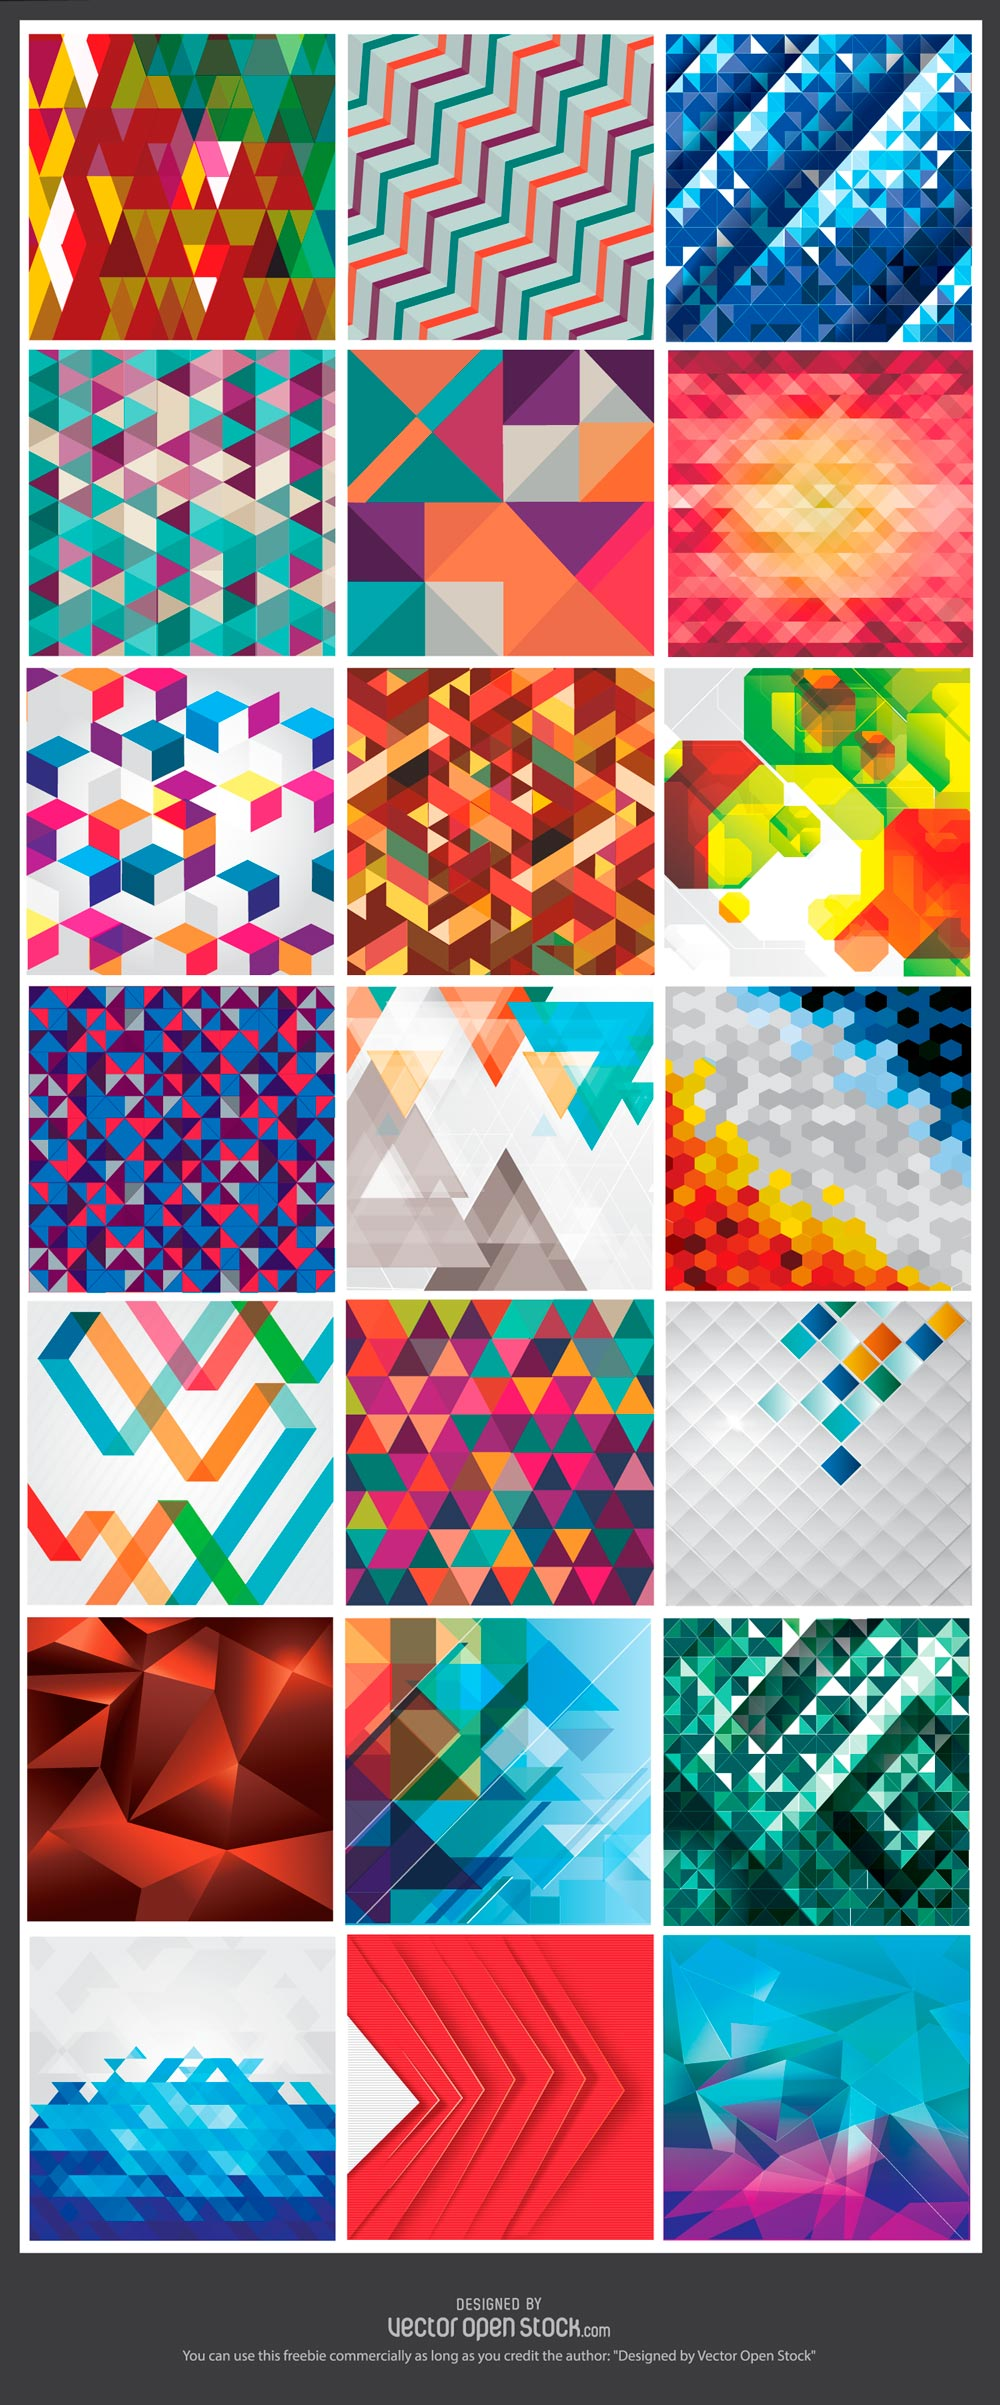 http://www.graphicsfuel.com/wp-content/uploads/2015/07/GeometricBackgroundFreebie.jpg